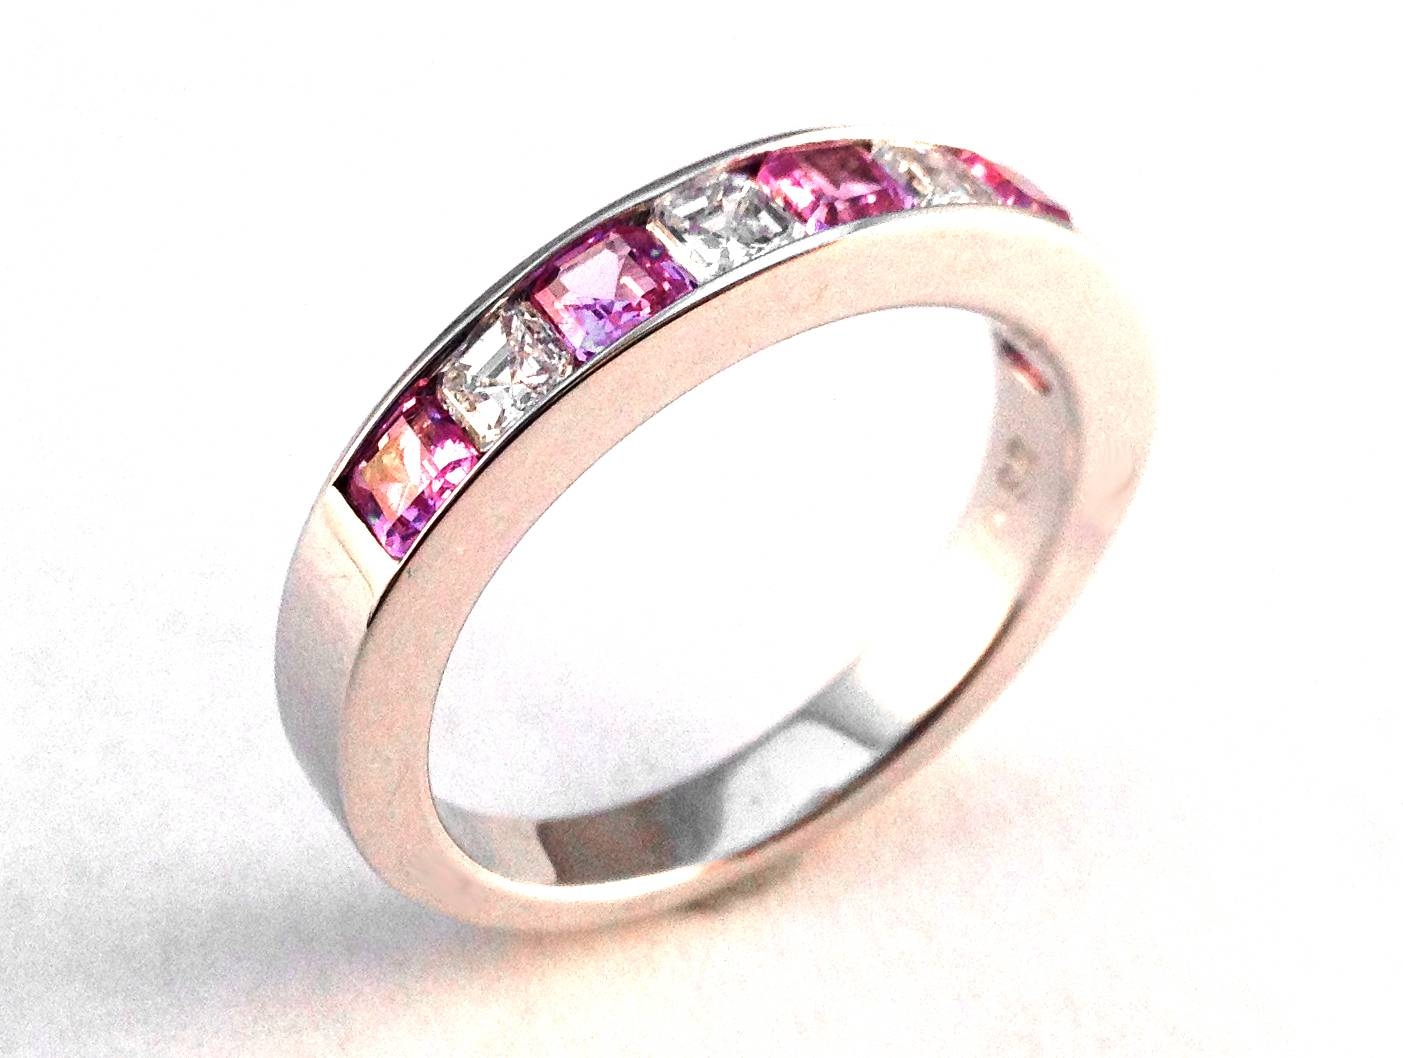 Wedding Band – Four Stone Asscher Diamond & Pink Sapphire Wedding Intended For Recent Pink Sapphire Diamond Wedding Bands (View 8 of 15)